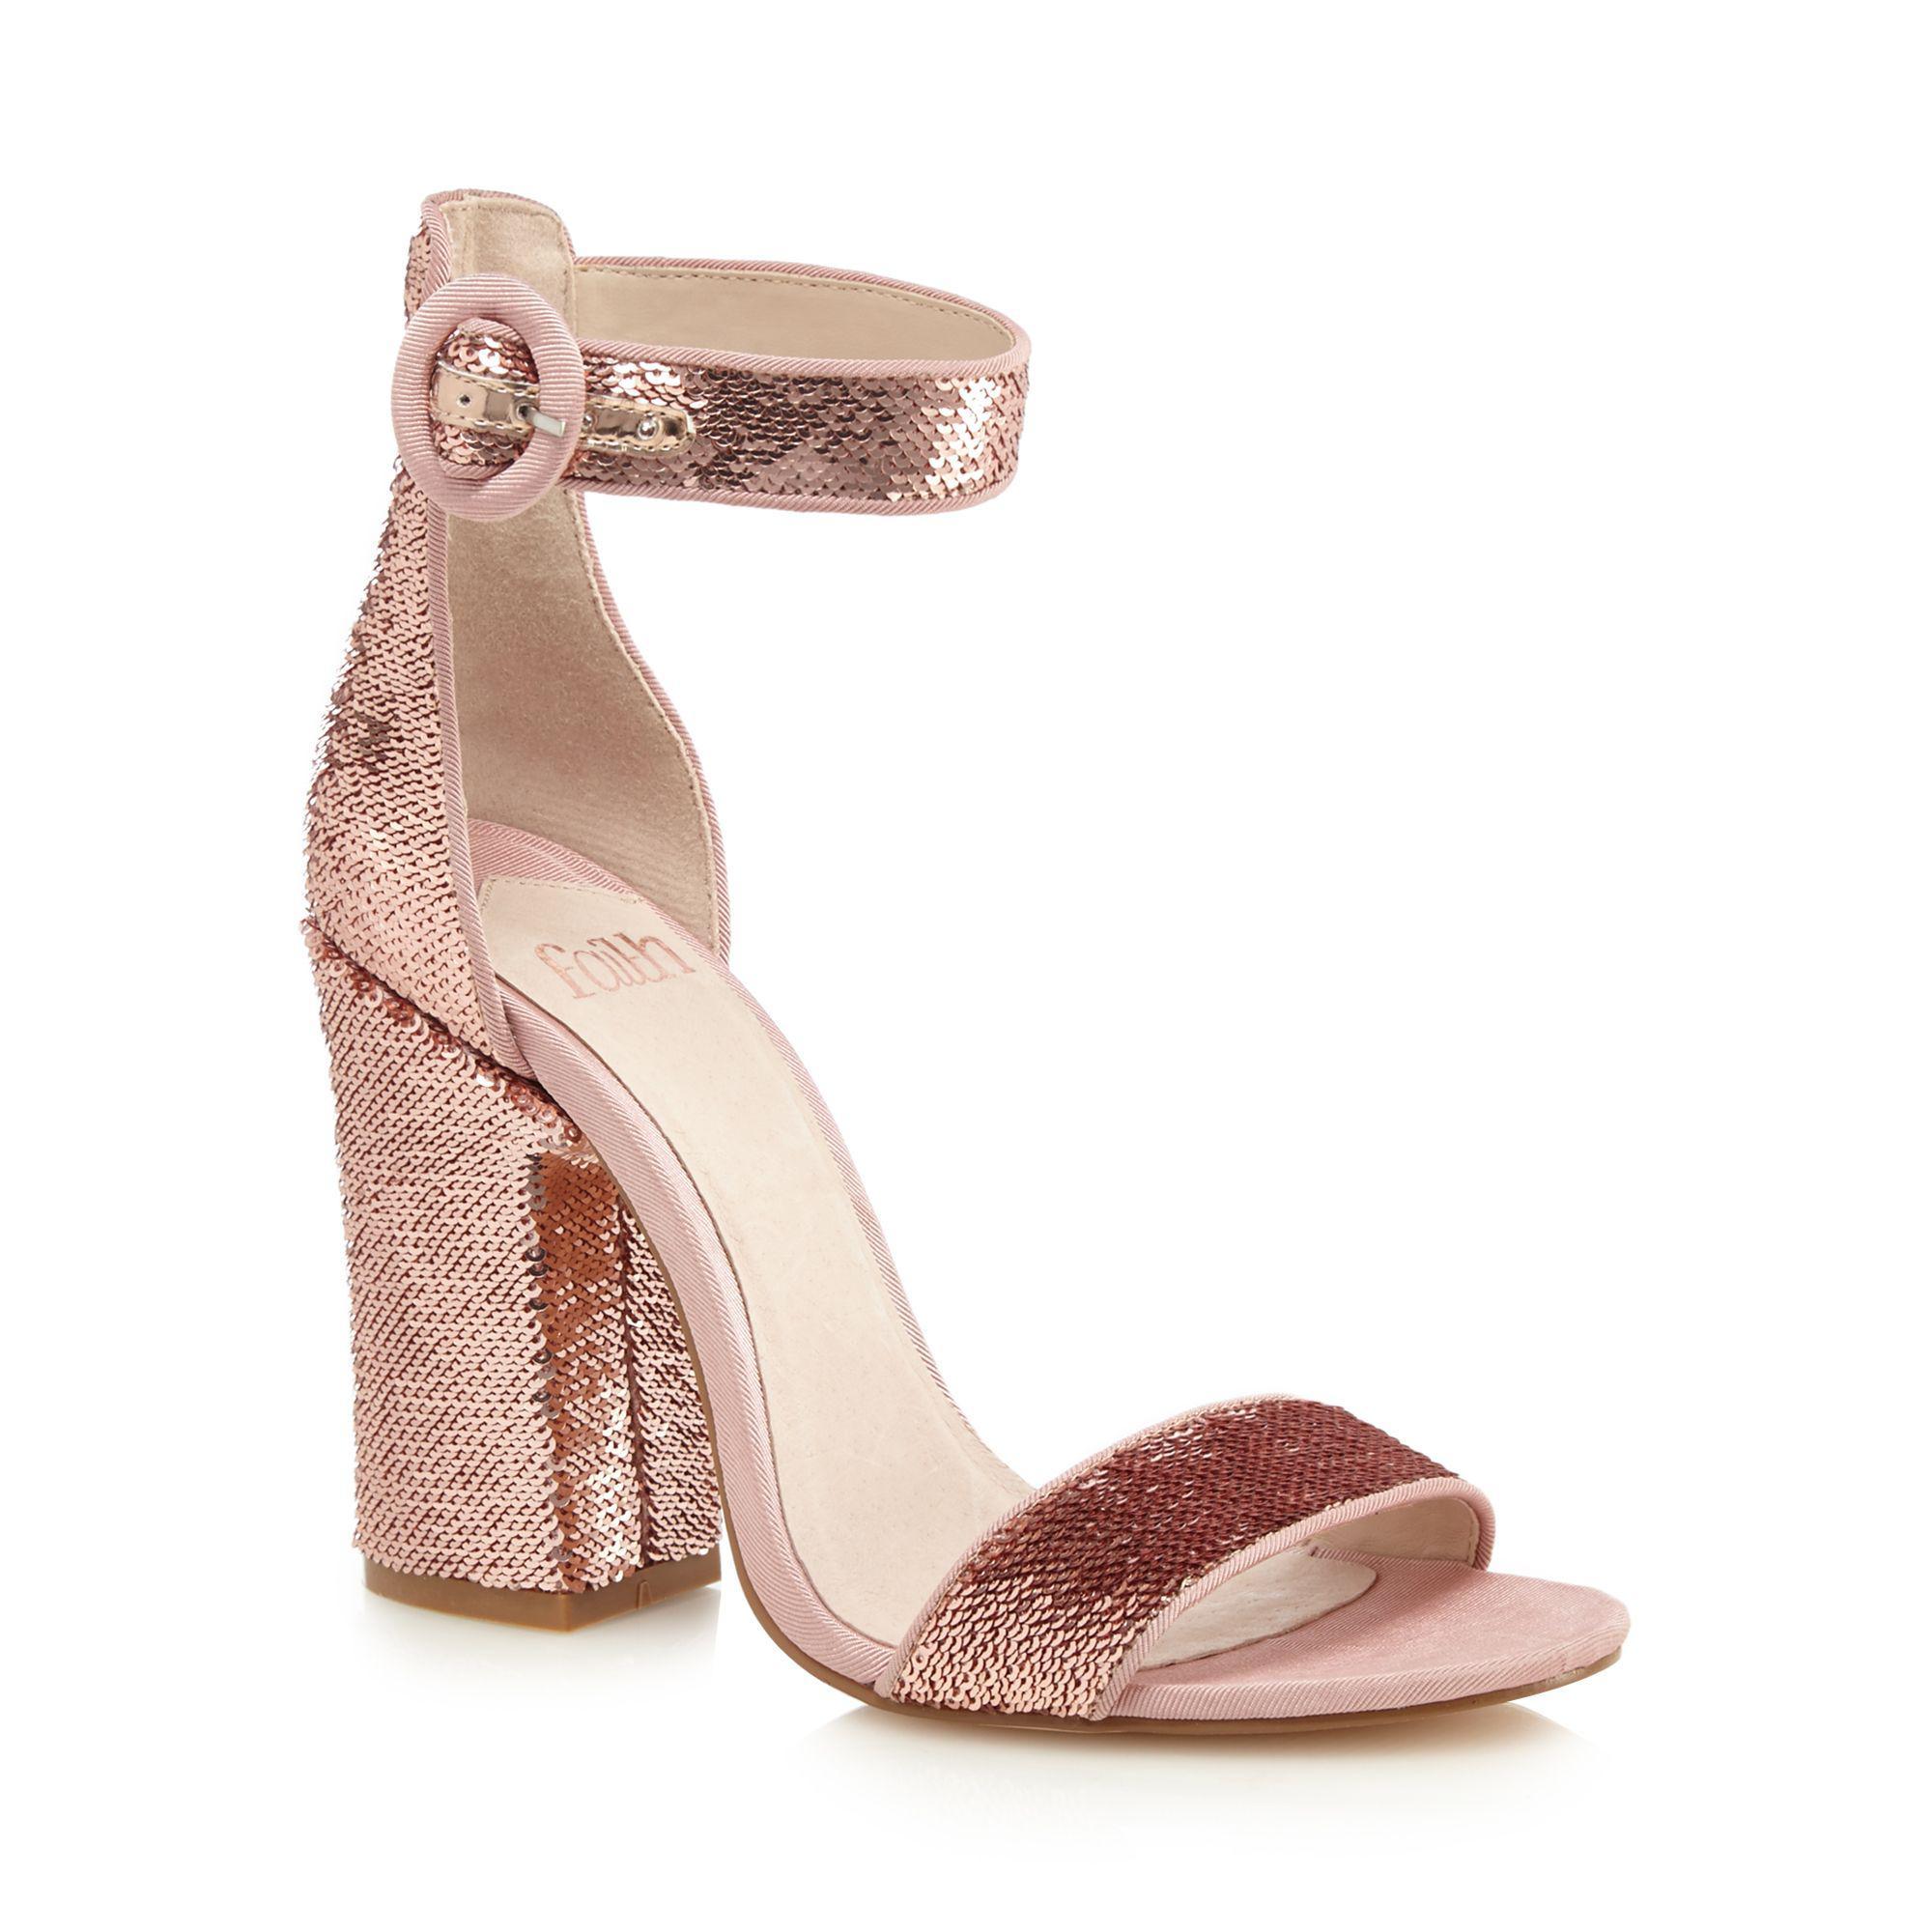 96549dfad4f Faith - Pink  danielle  High Block Heel Ankle Strap Sandals - Lyst. View  fullscreen